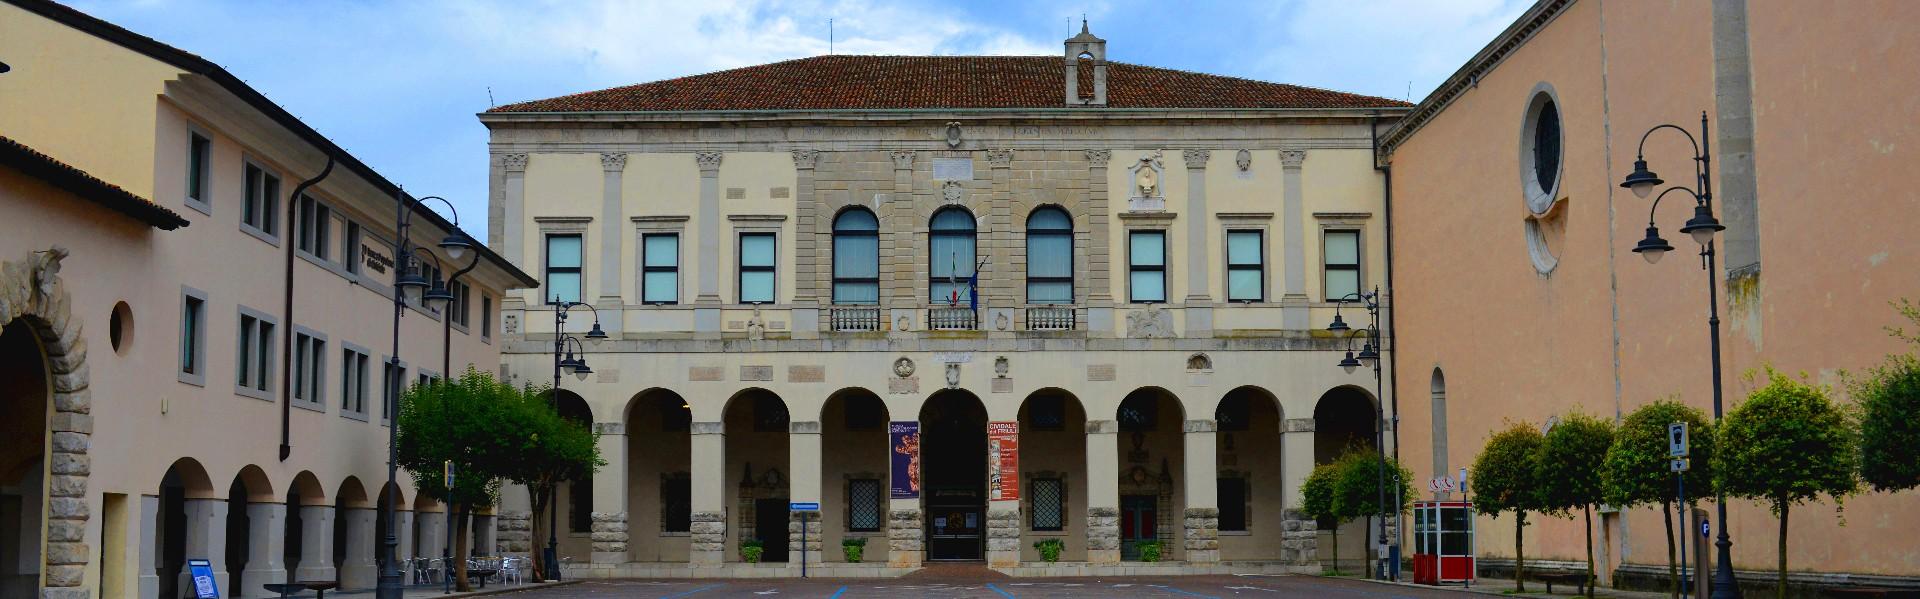 Museo Archeologico Nazionale.Museo Archeologico Nazionale Www Cividale Com